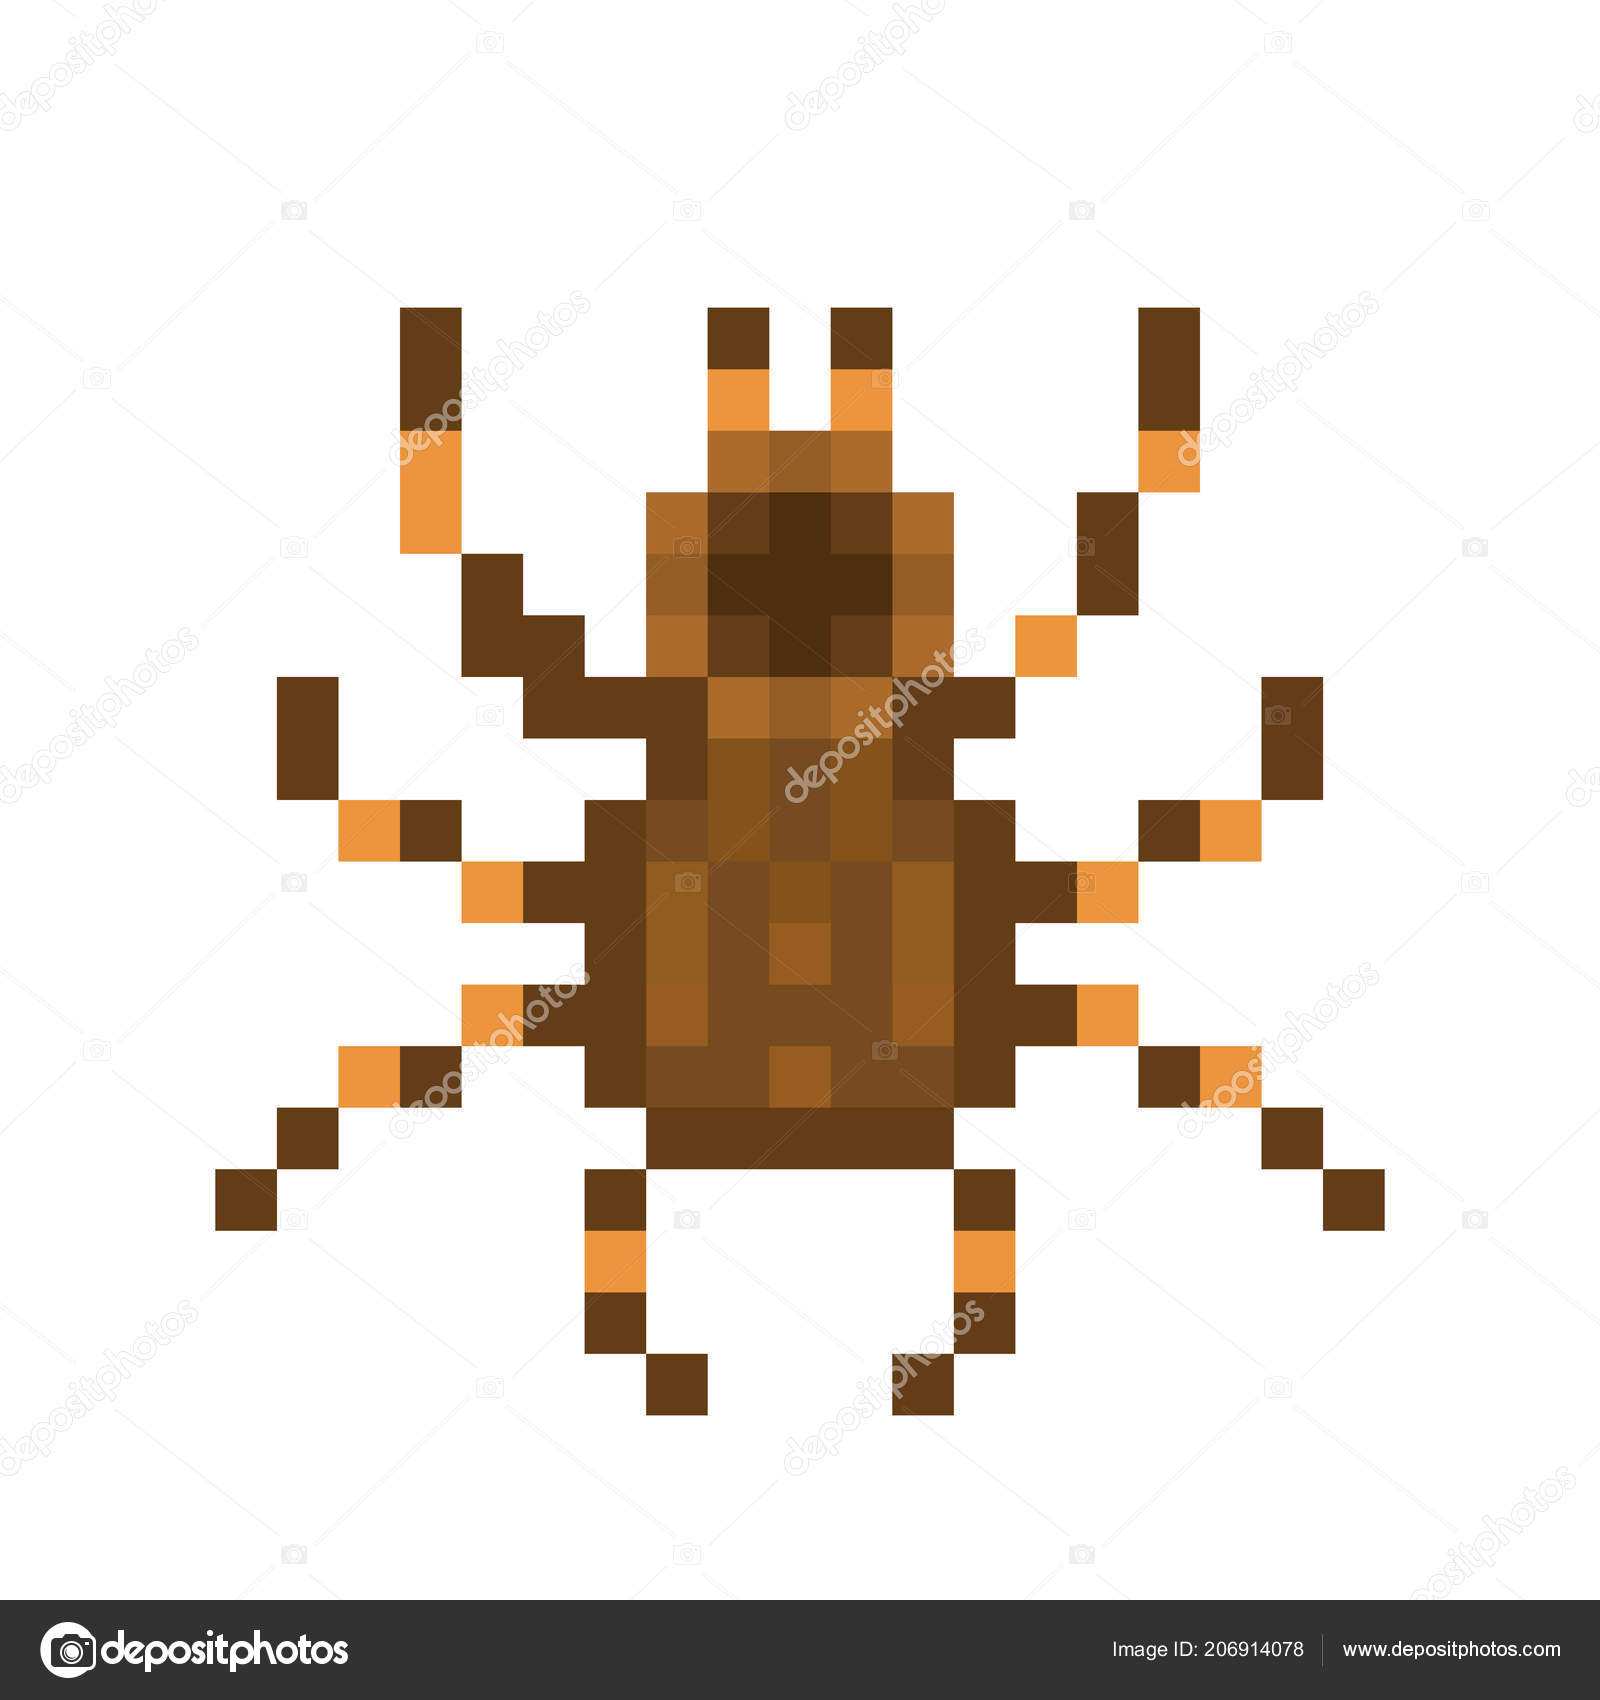 Tarântula Arte Pixel Isolada Fundo Branco Aranha Estimação